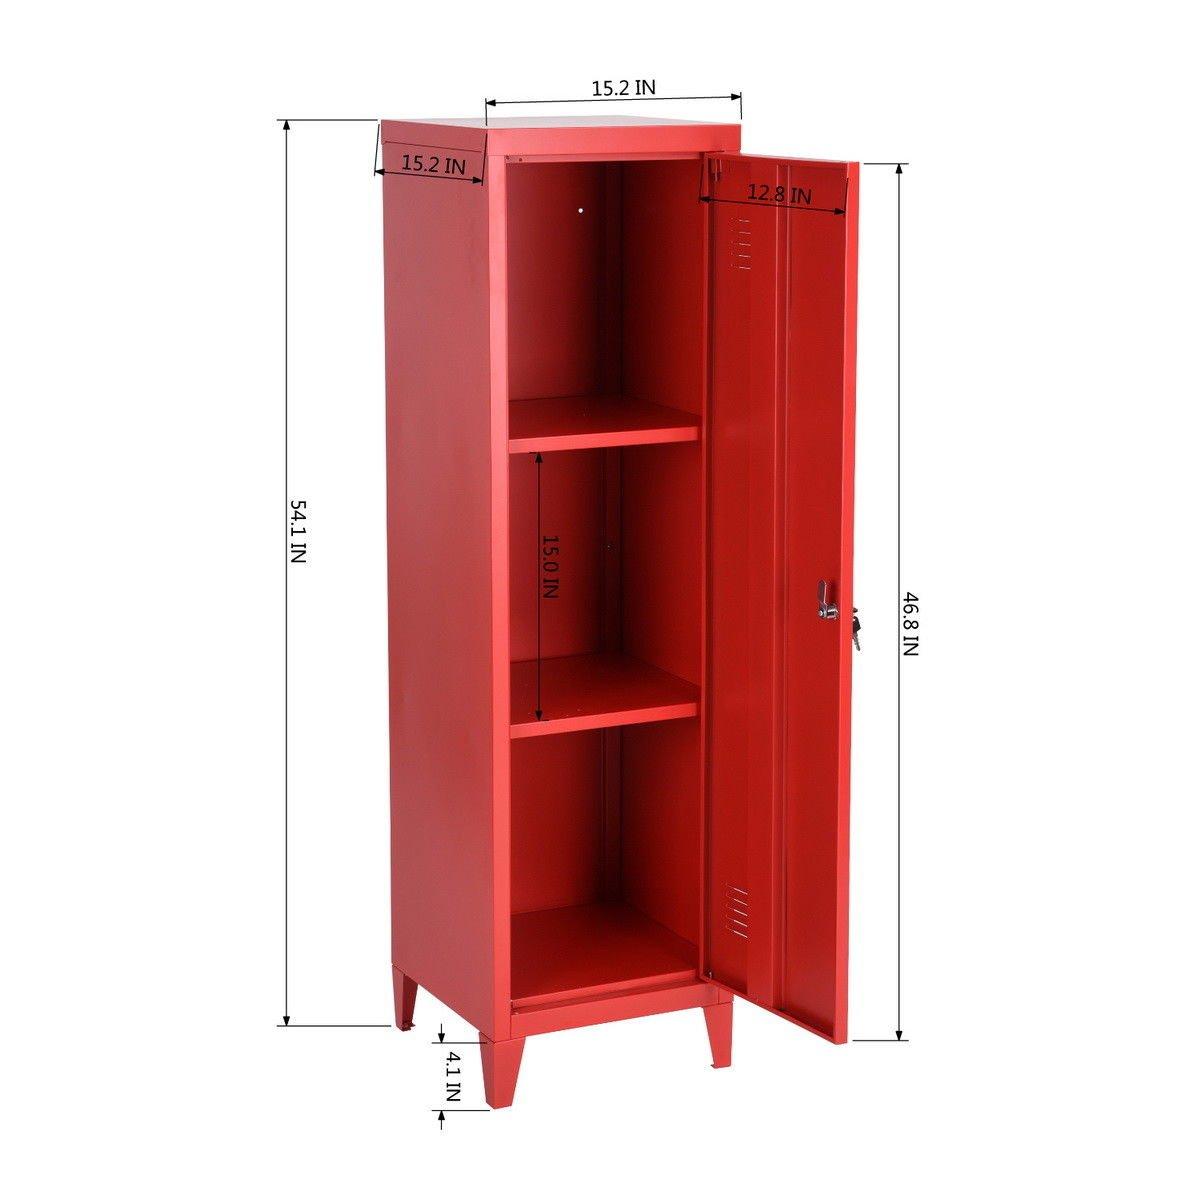 HouseinBox Office File Storage Metal Cabinet 3 Door Cupboard Locker Organizer Console Stand 3-in-1 (RED-Standing Locker) by HouseinBox (Image #4)